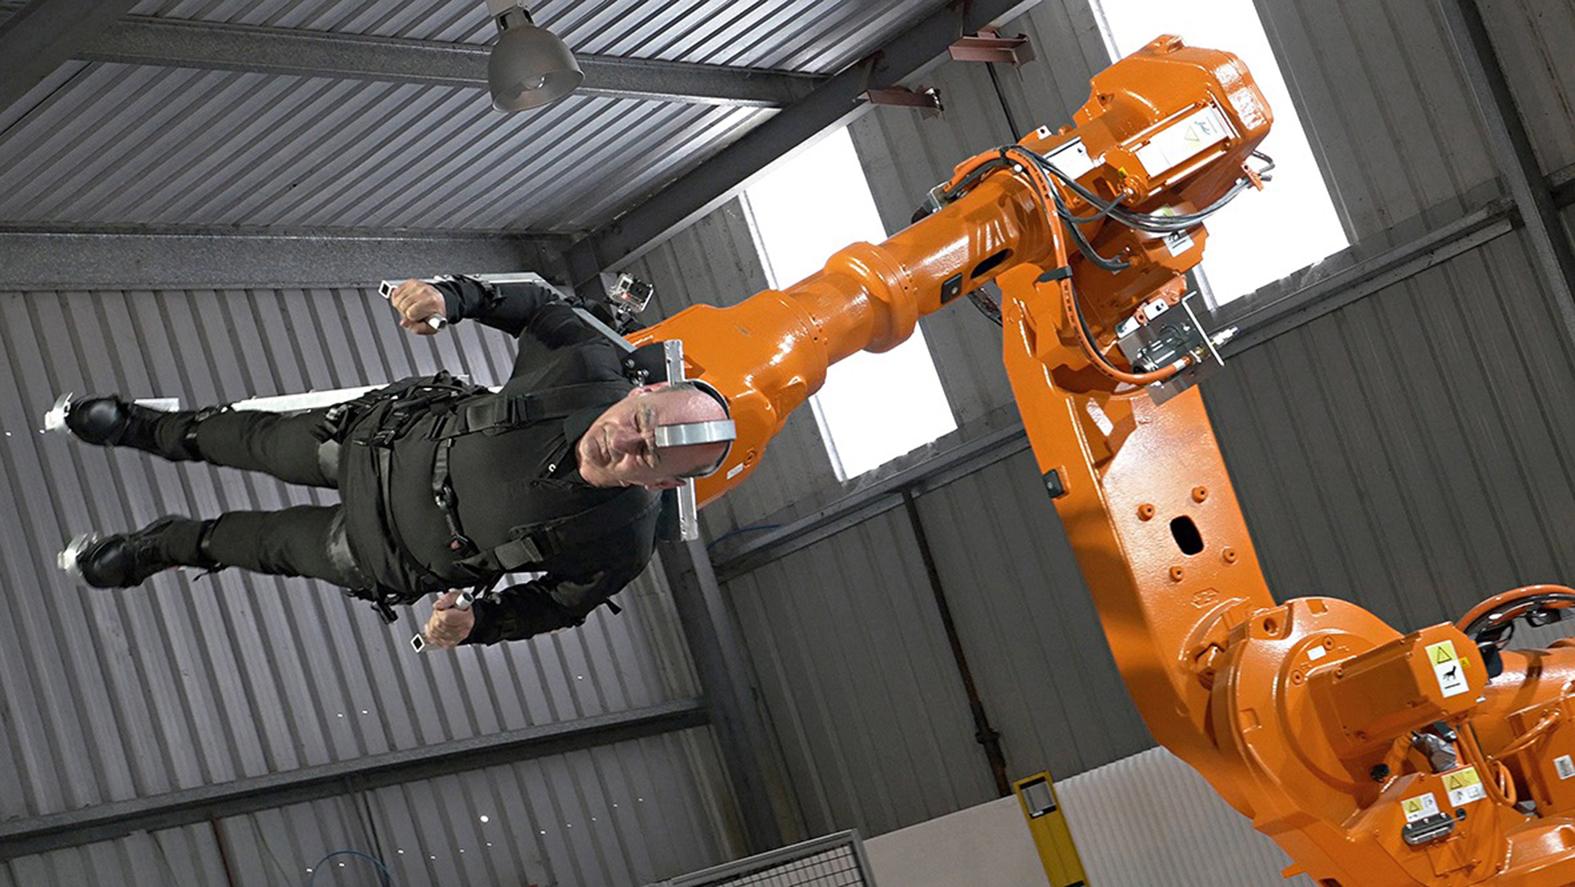 4. Propel - Body on Robot Arm Stelarc